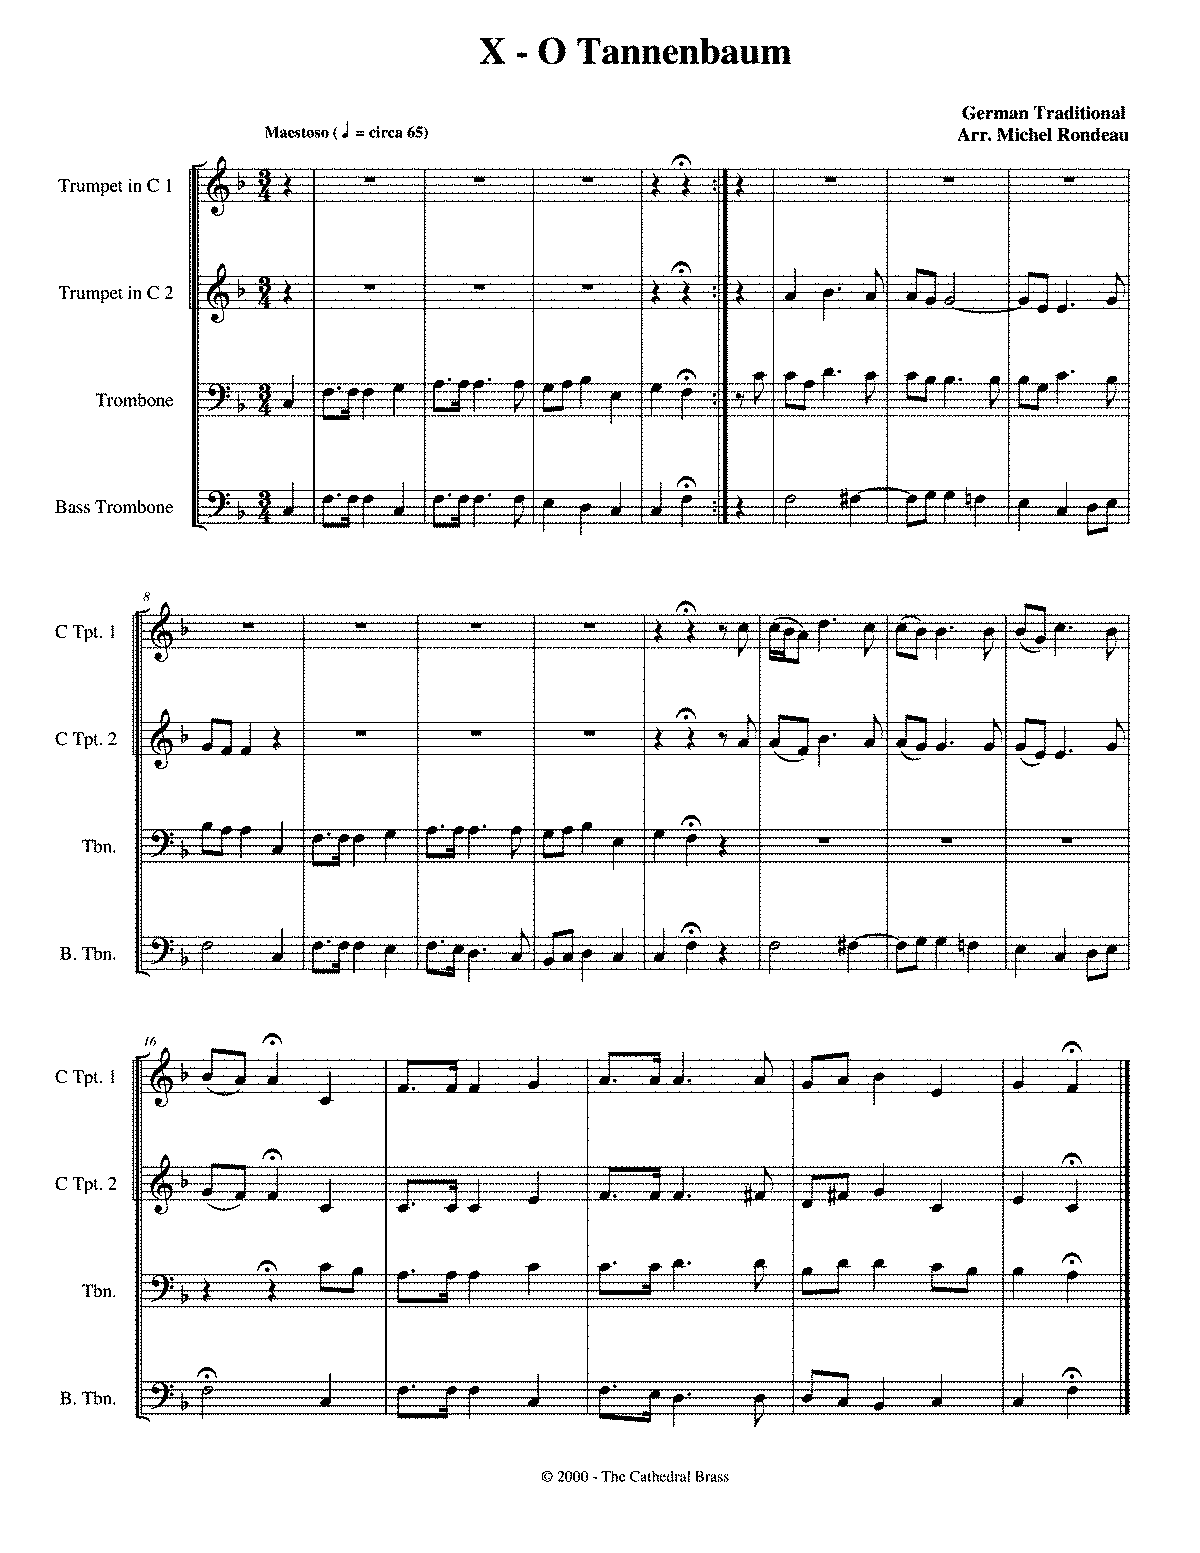 O tannenbaum rondeau michel imslp petrucci music for Obi tannenbaum